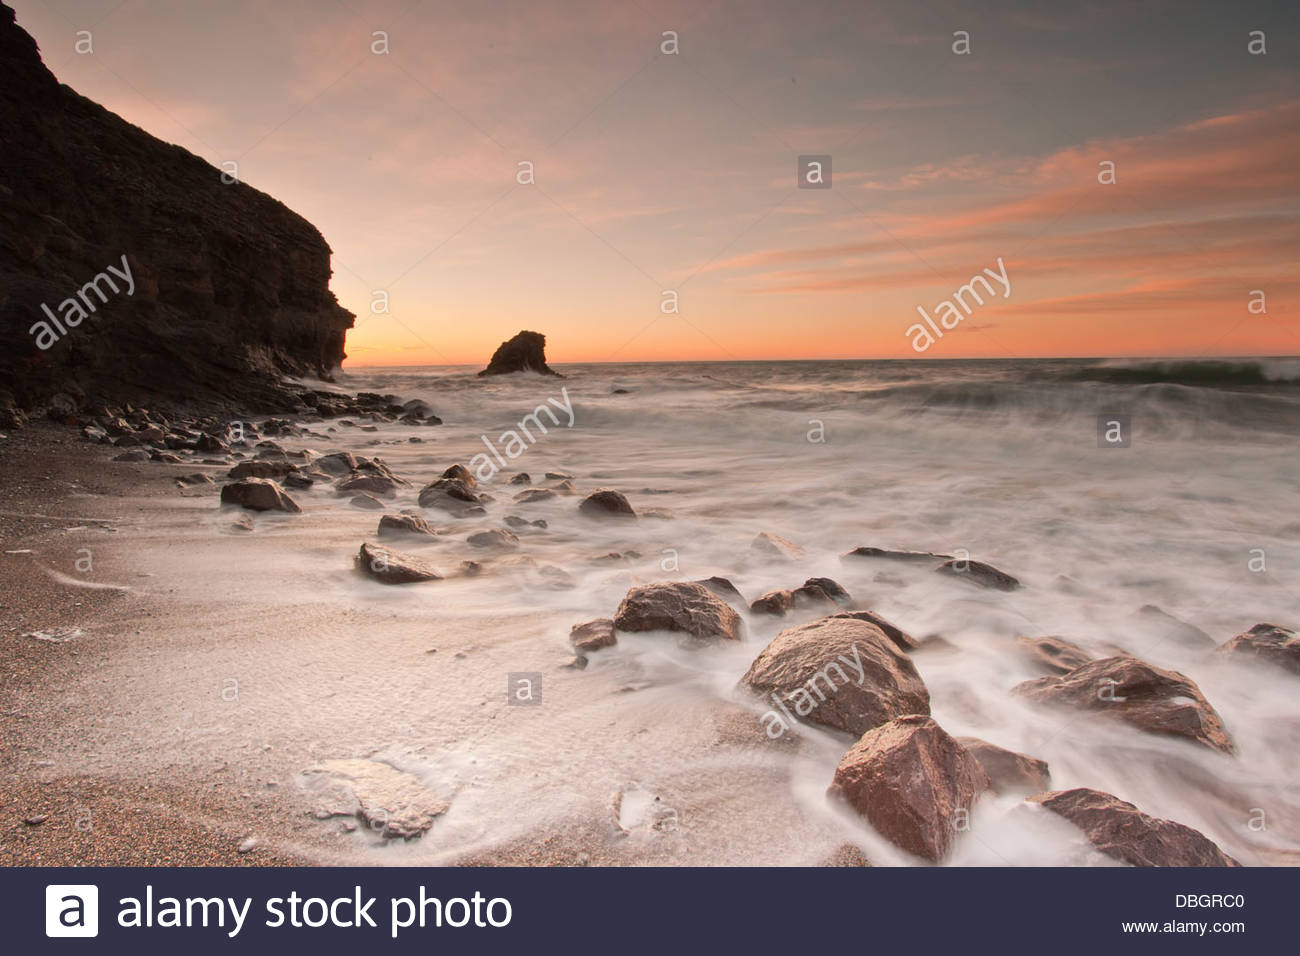 Rising sun at Cala del Barco, in Cartagena, Murcia, Spain. Sunrise at the beach - Stock Image